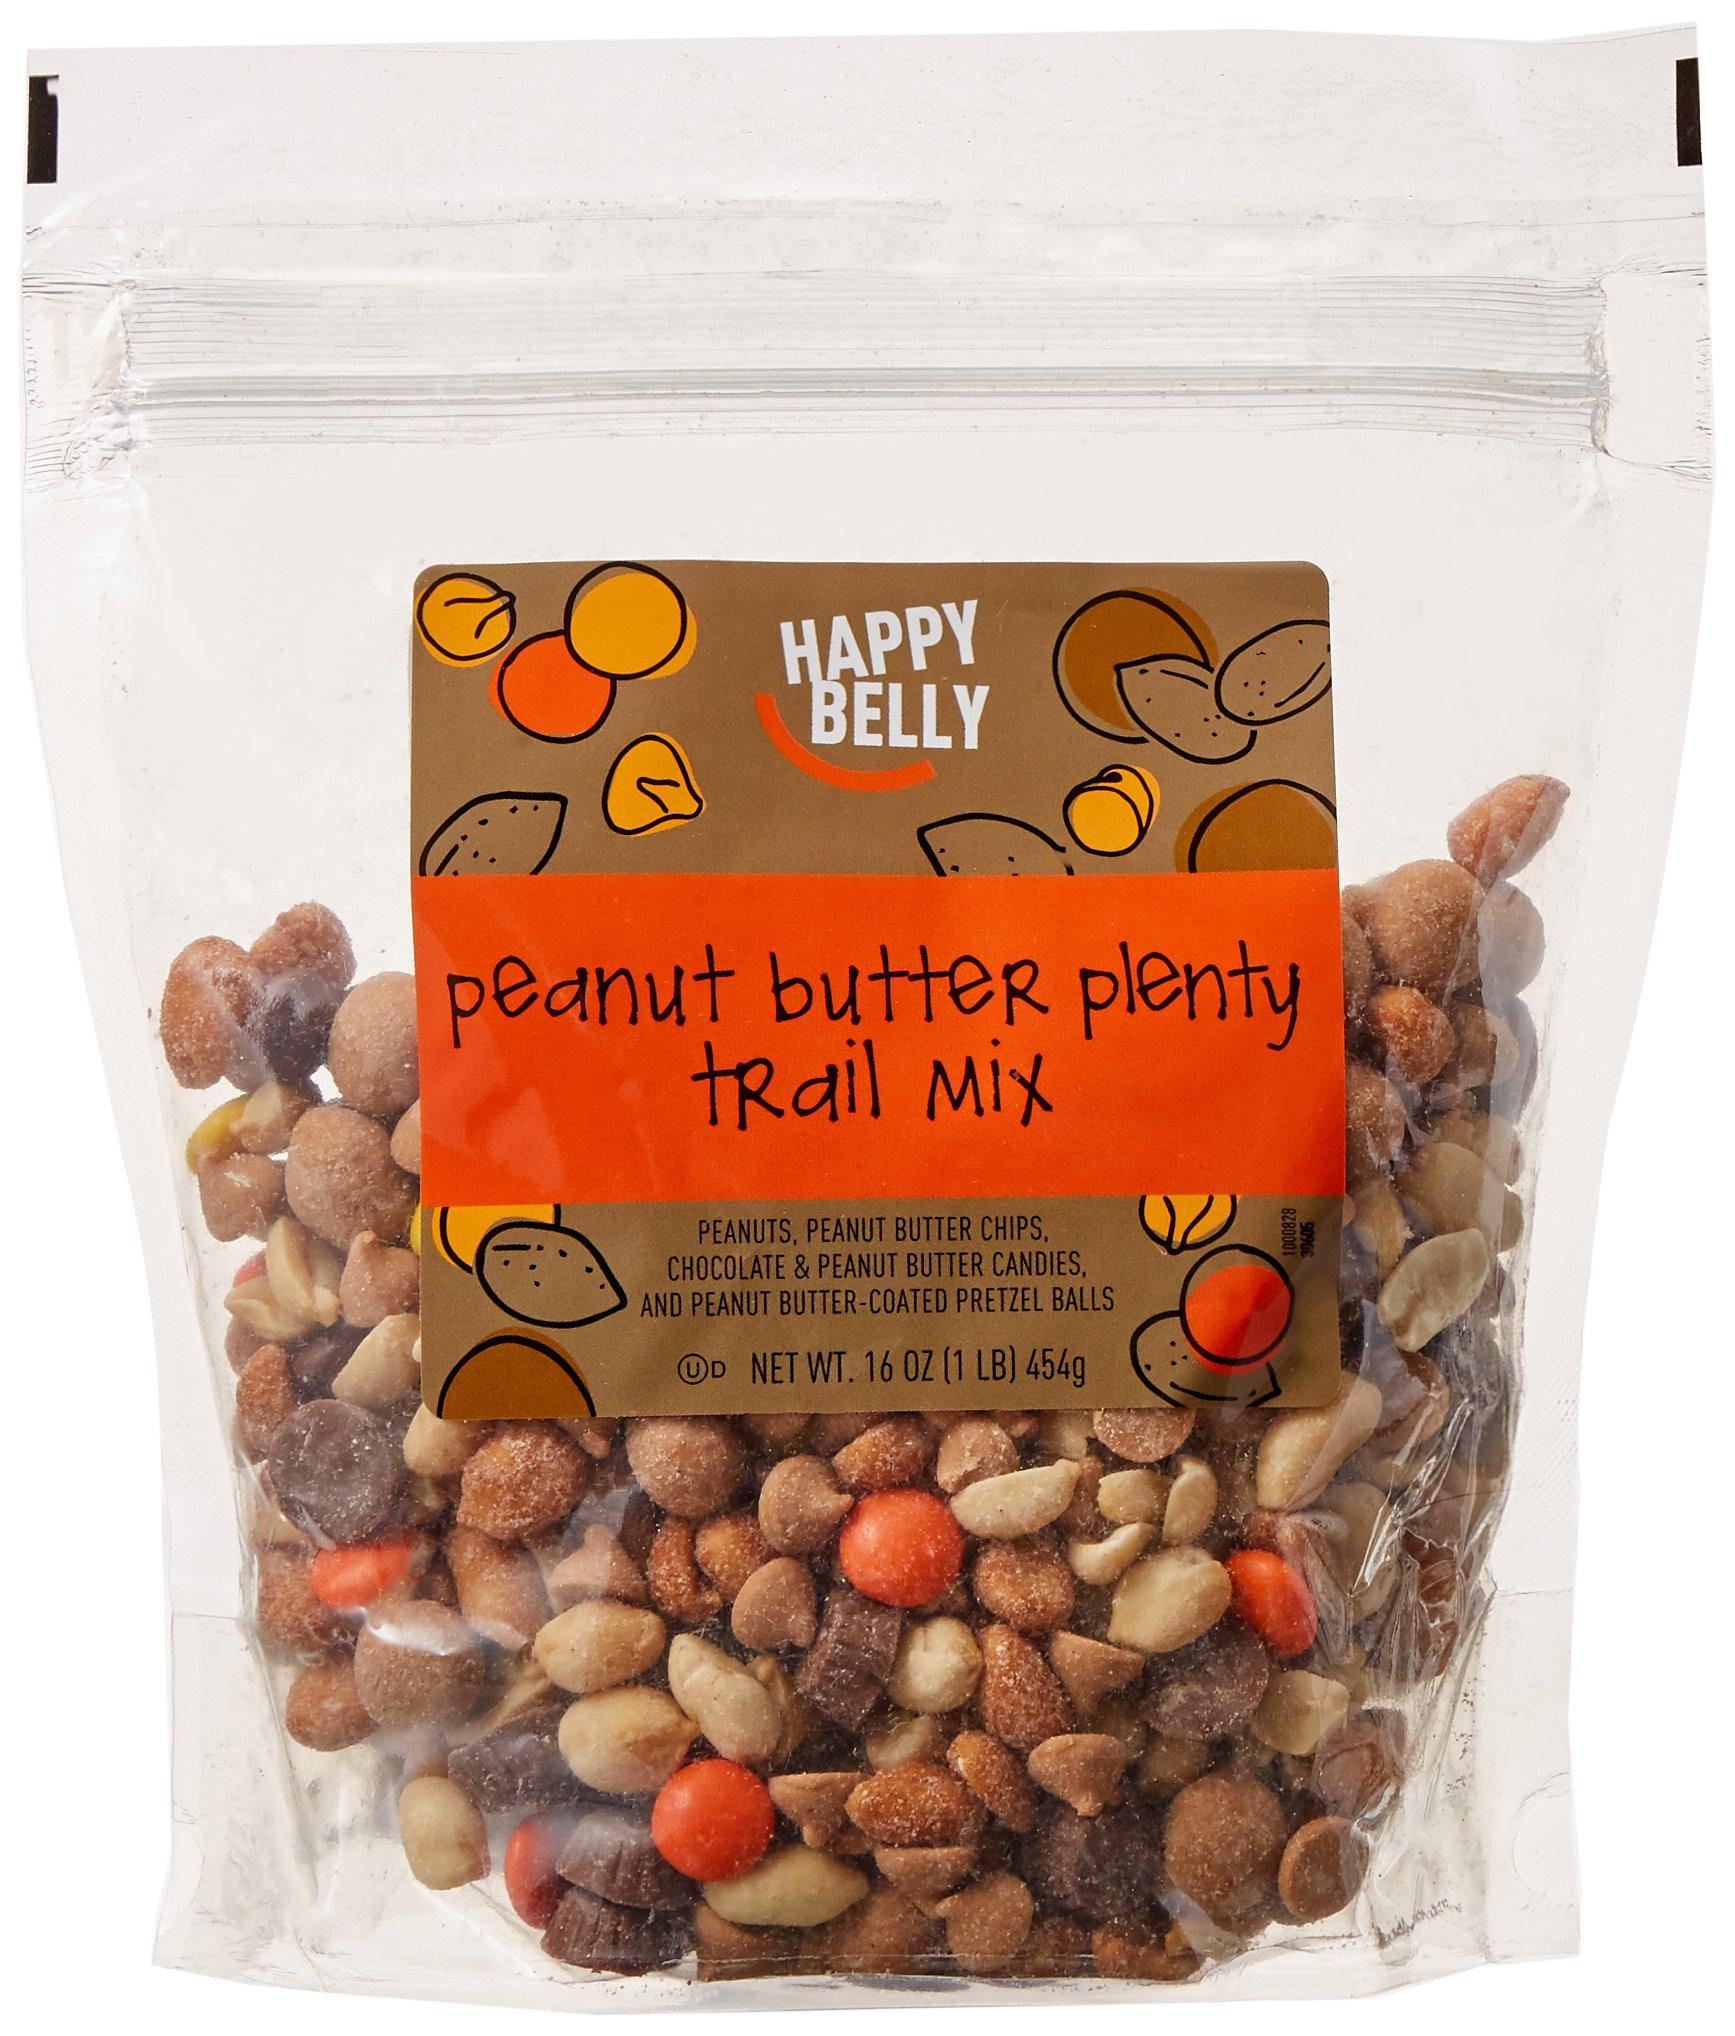 Amazon Brand - Happy Belly Peanut Butter Plenty Trail Mix, 16 ounce